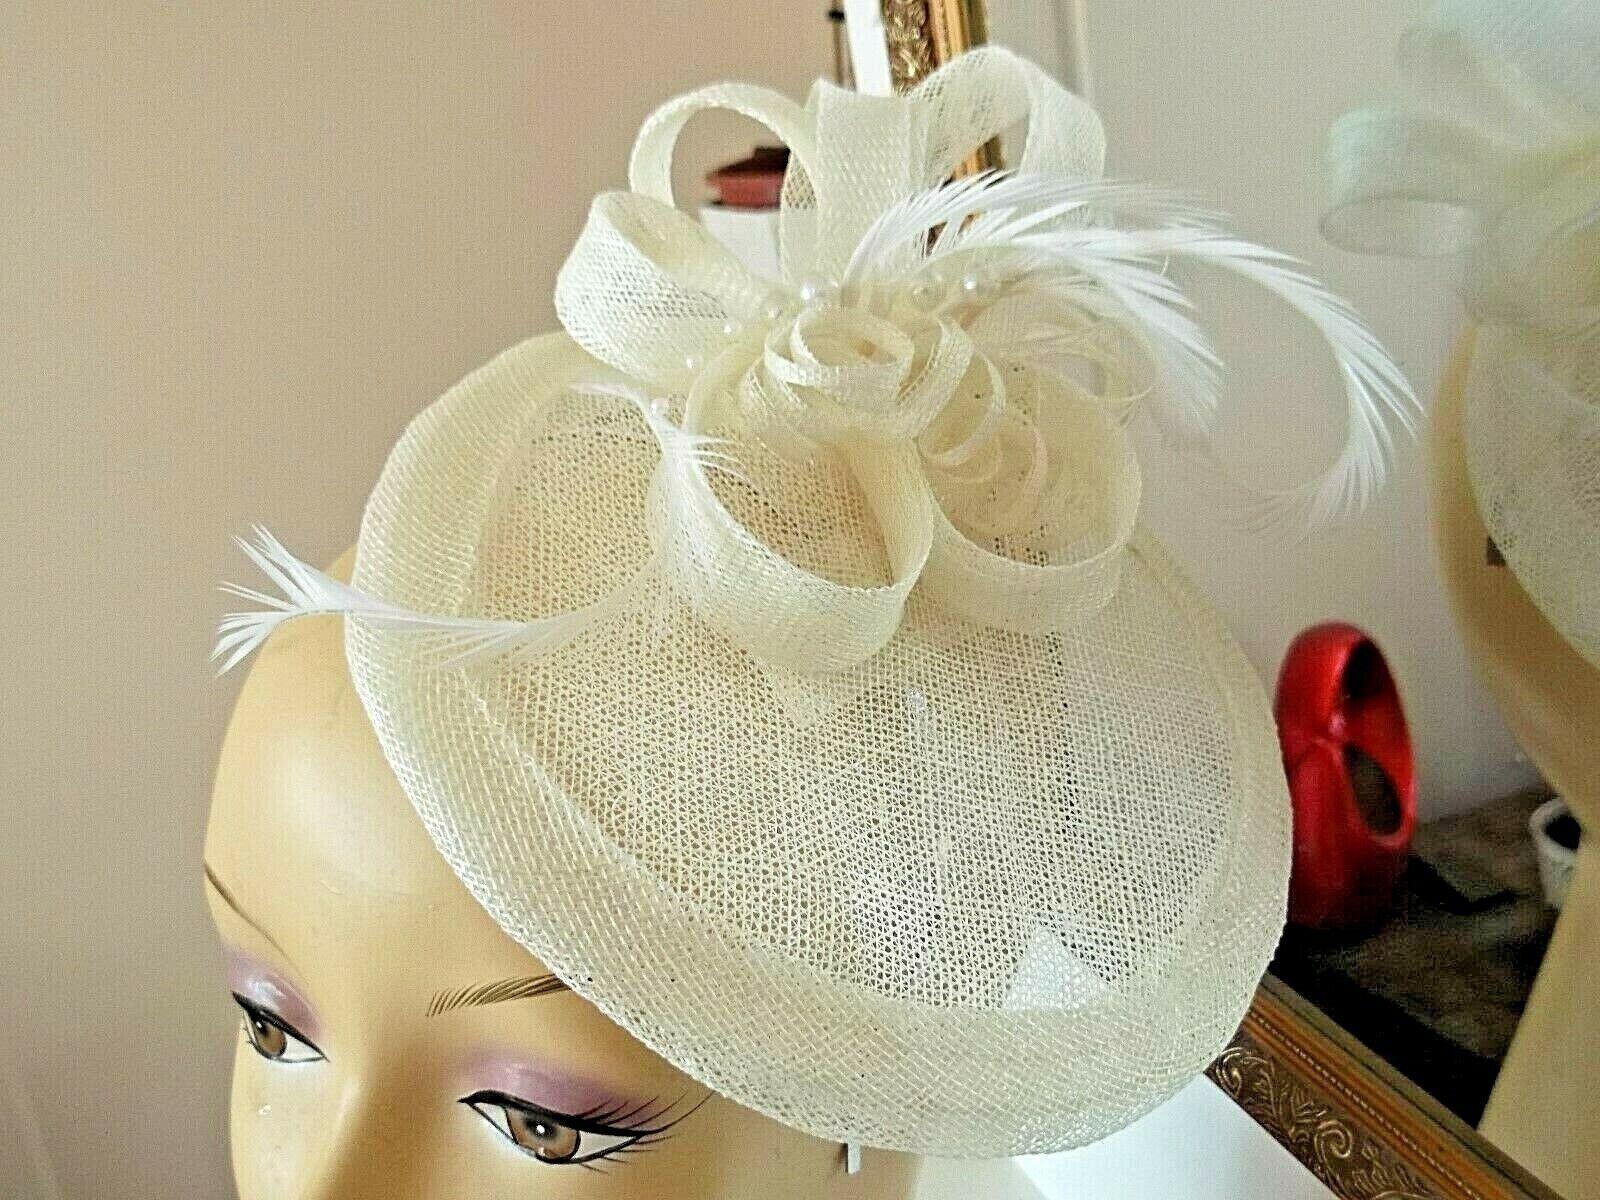 Fascinator in cream - Ascot races, Wedding, Prom, Church 6 inches